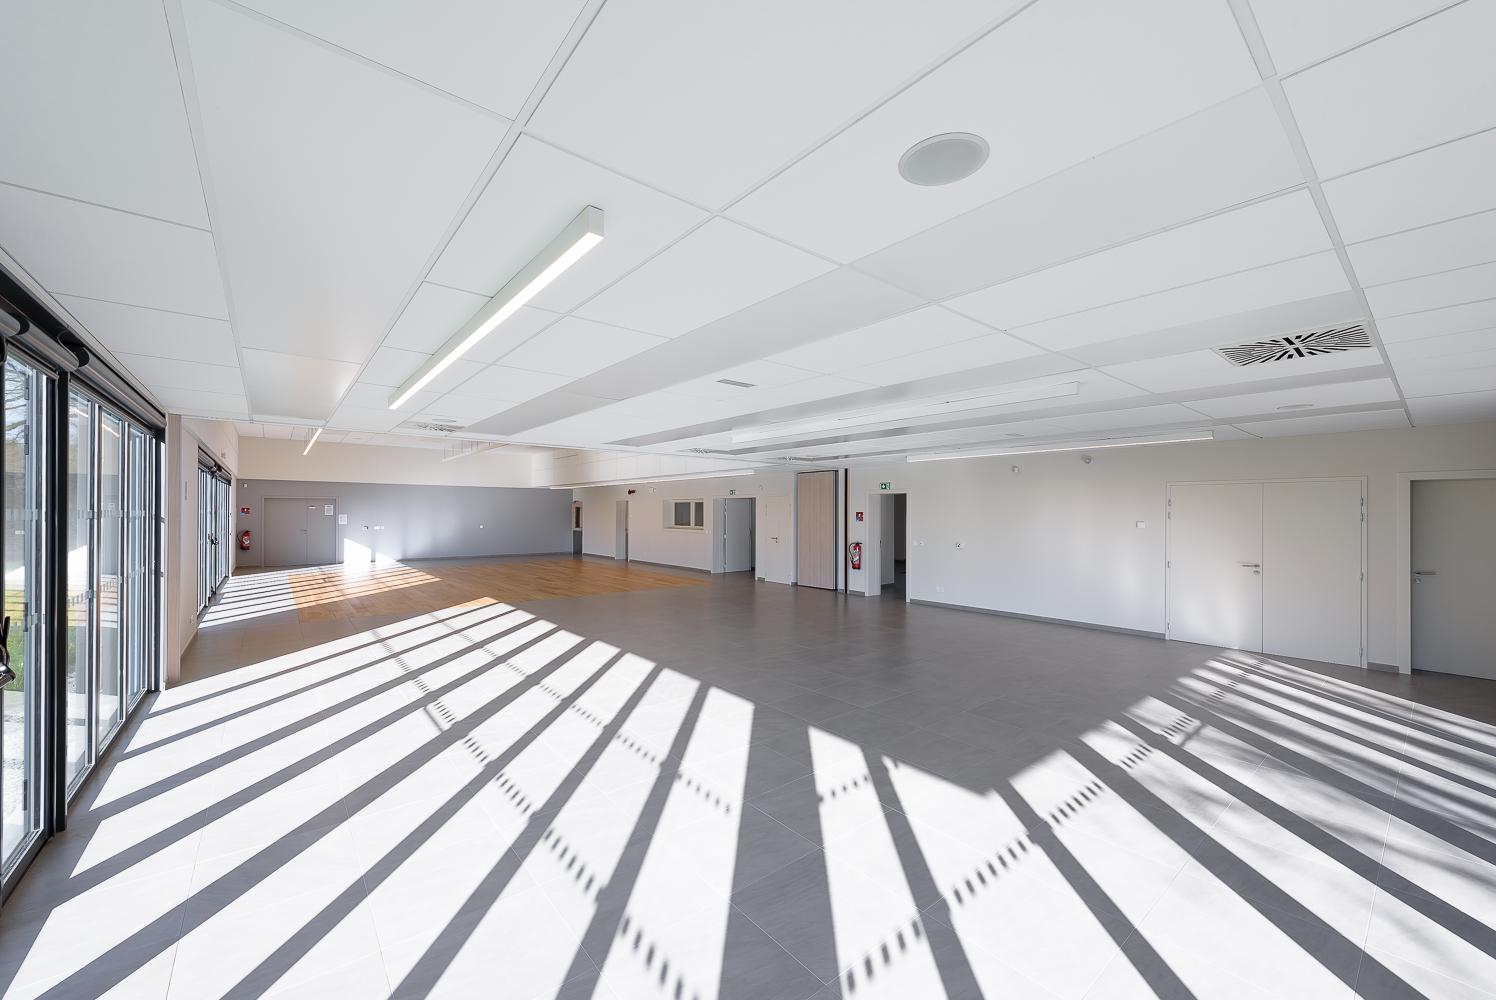 photographe d'architecture ©INTERVALphoto : STUDIO 2, salle communale, Plémet (22)